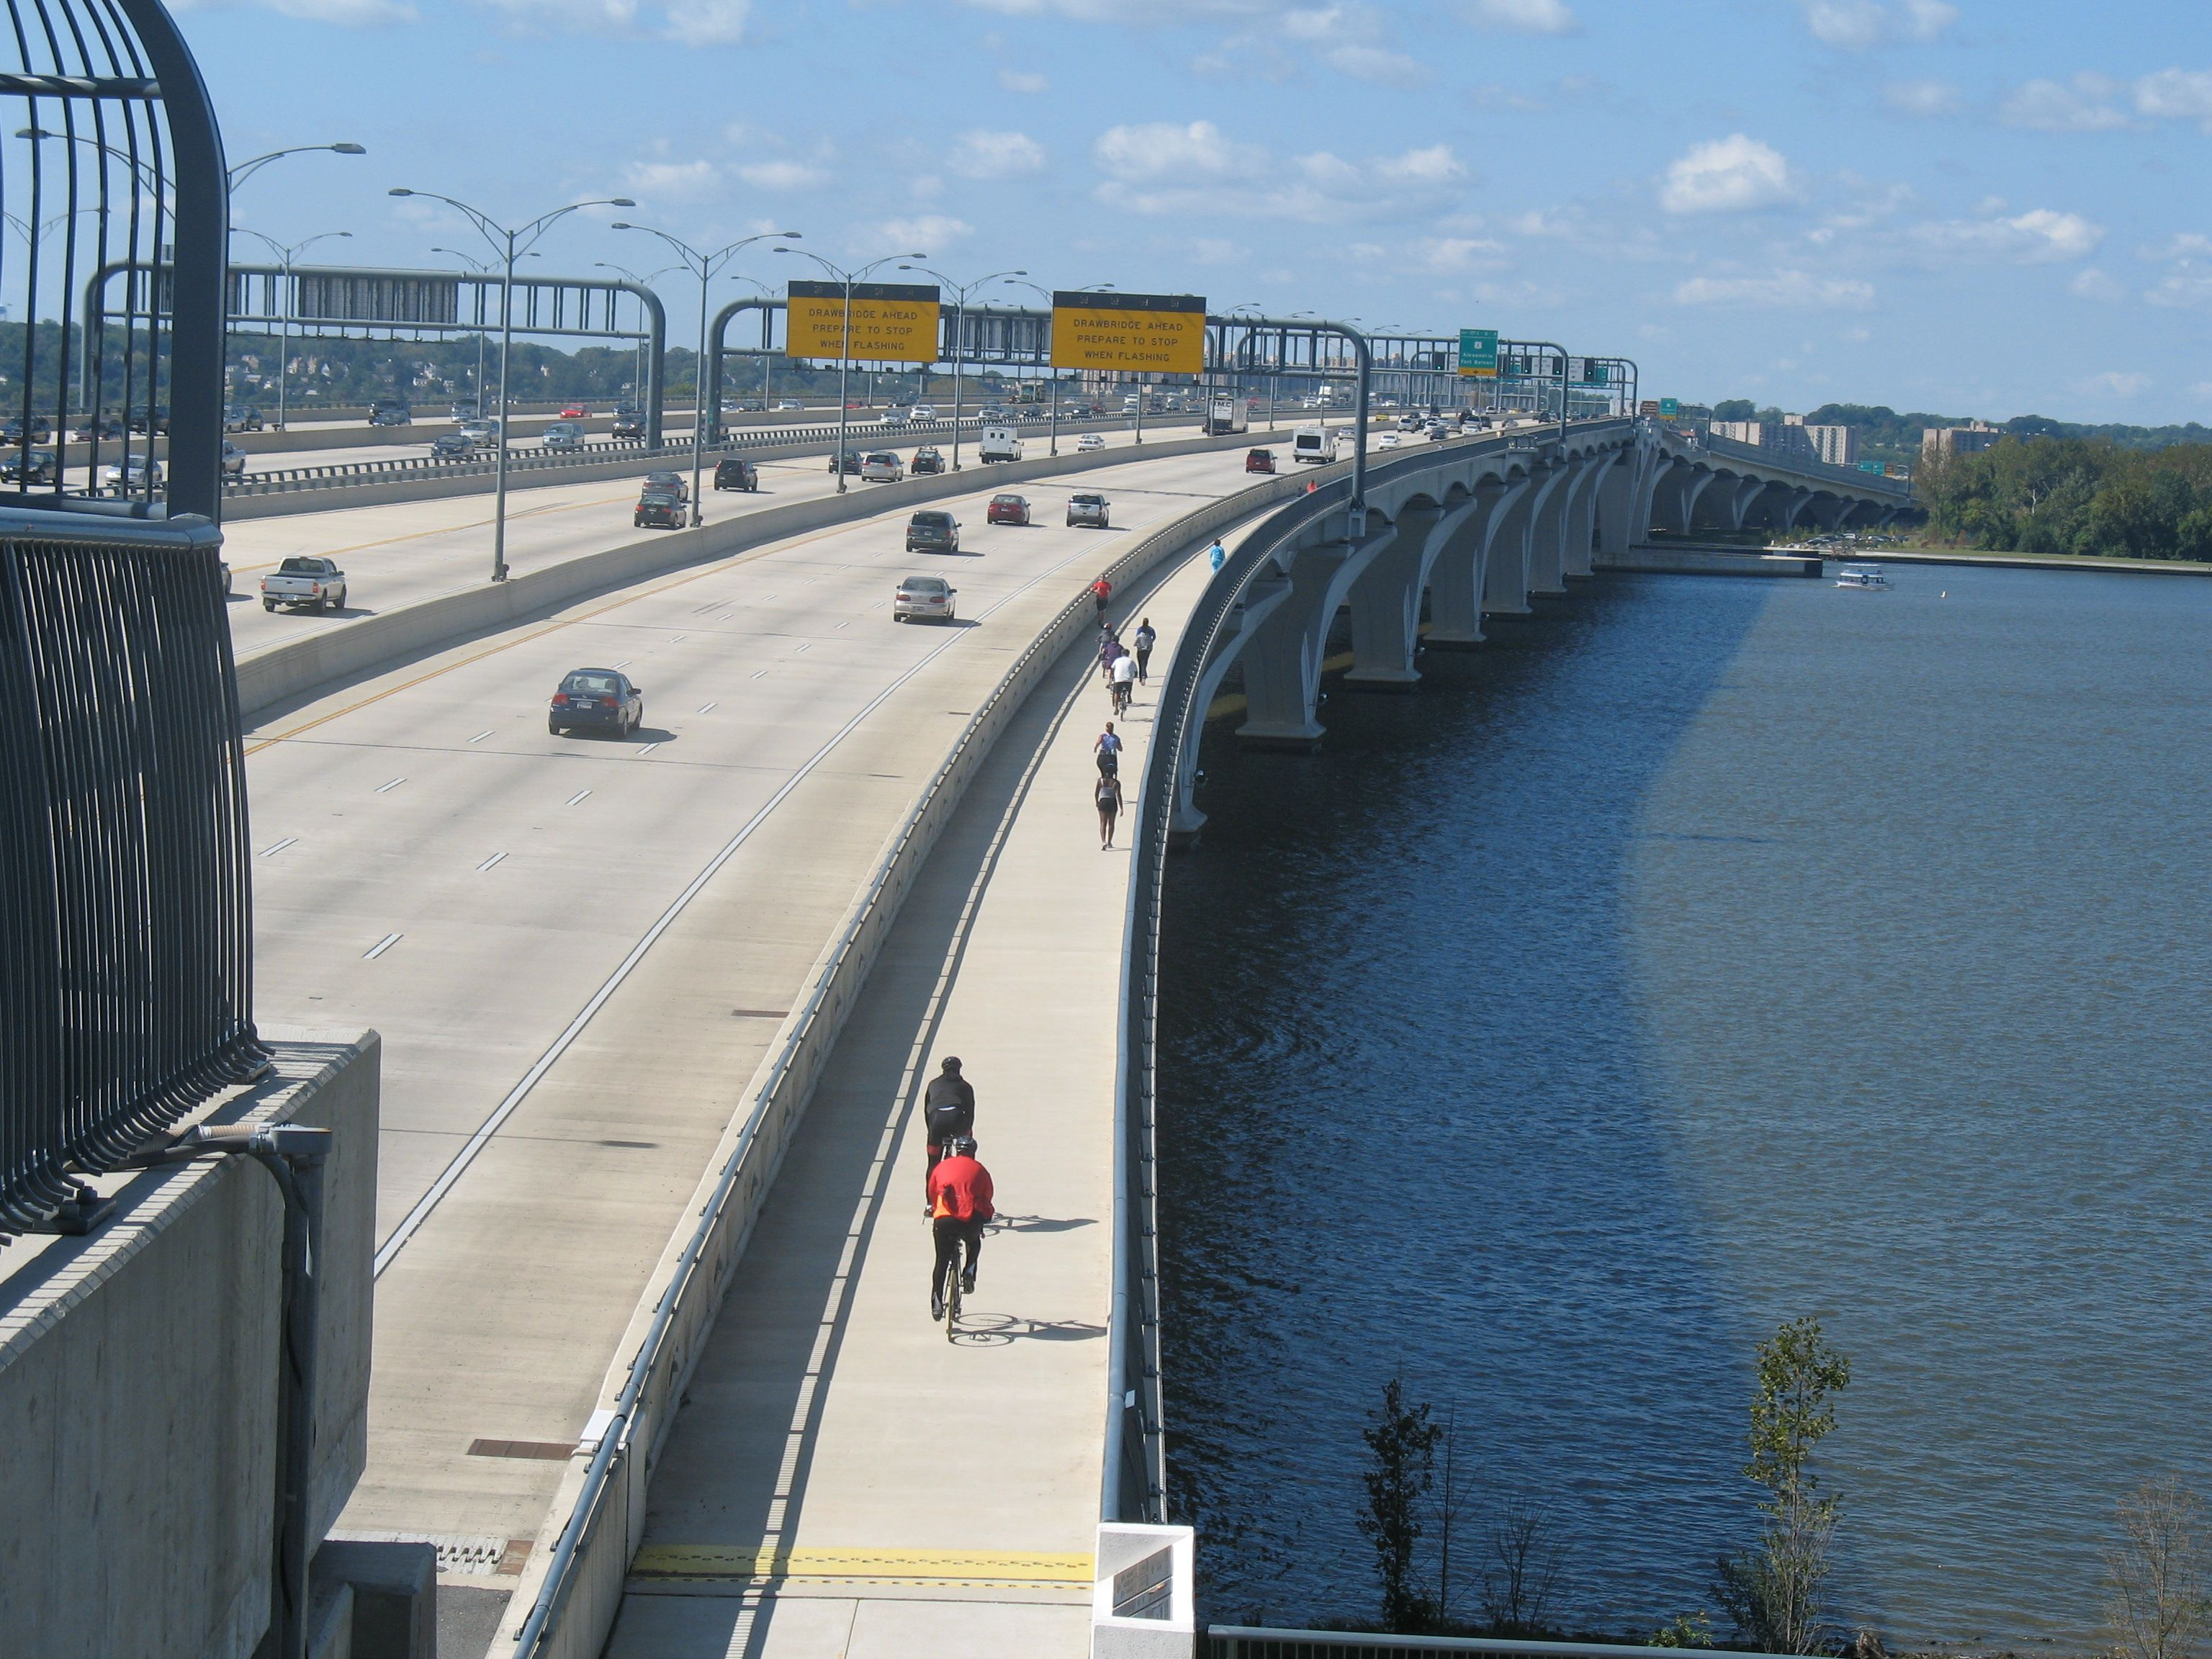 Roller skating rink laurel md - The New Woodrow Wilson Bridge Bikeway Links National Harbor Md To Alexandria